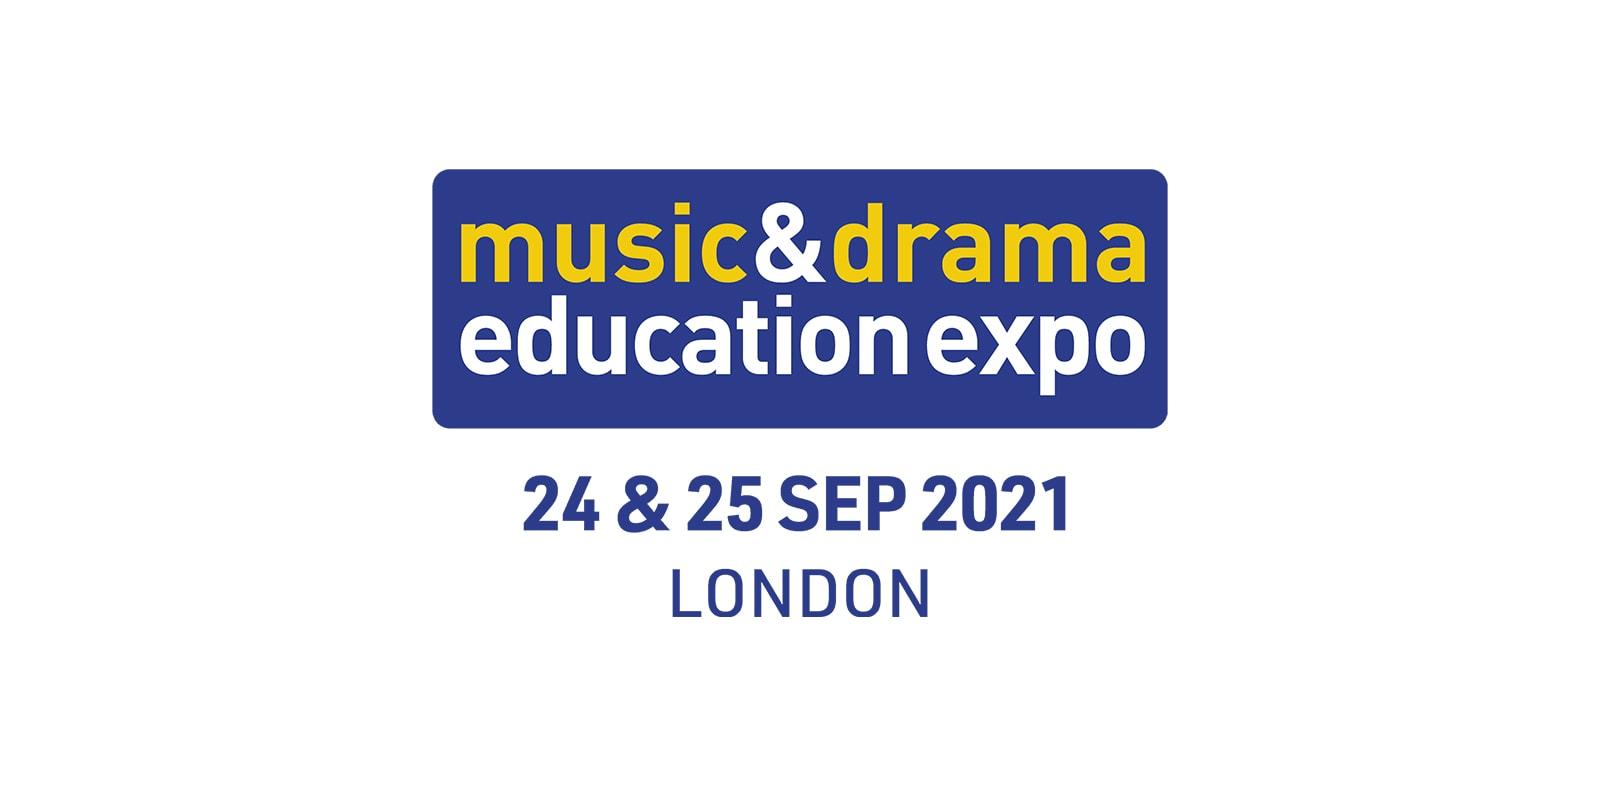 Music & Drama Education Expo | London 2021